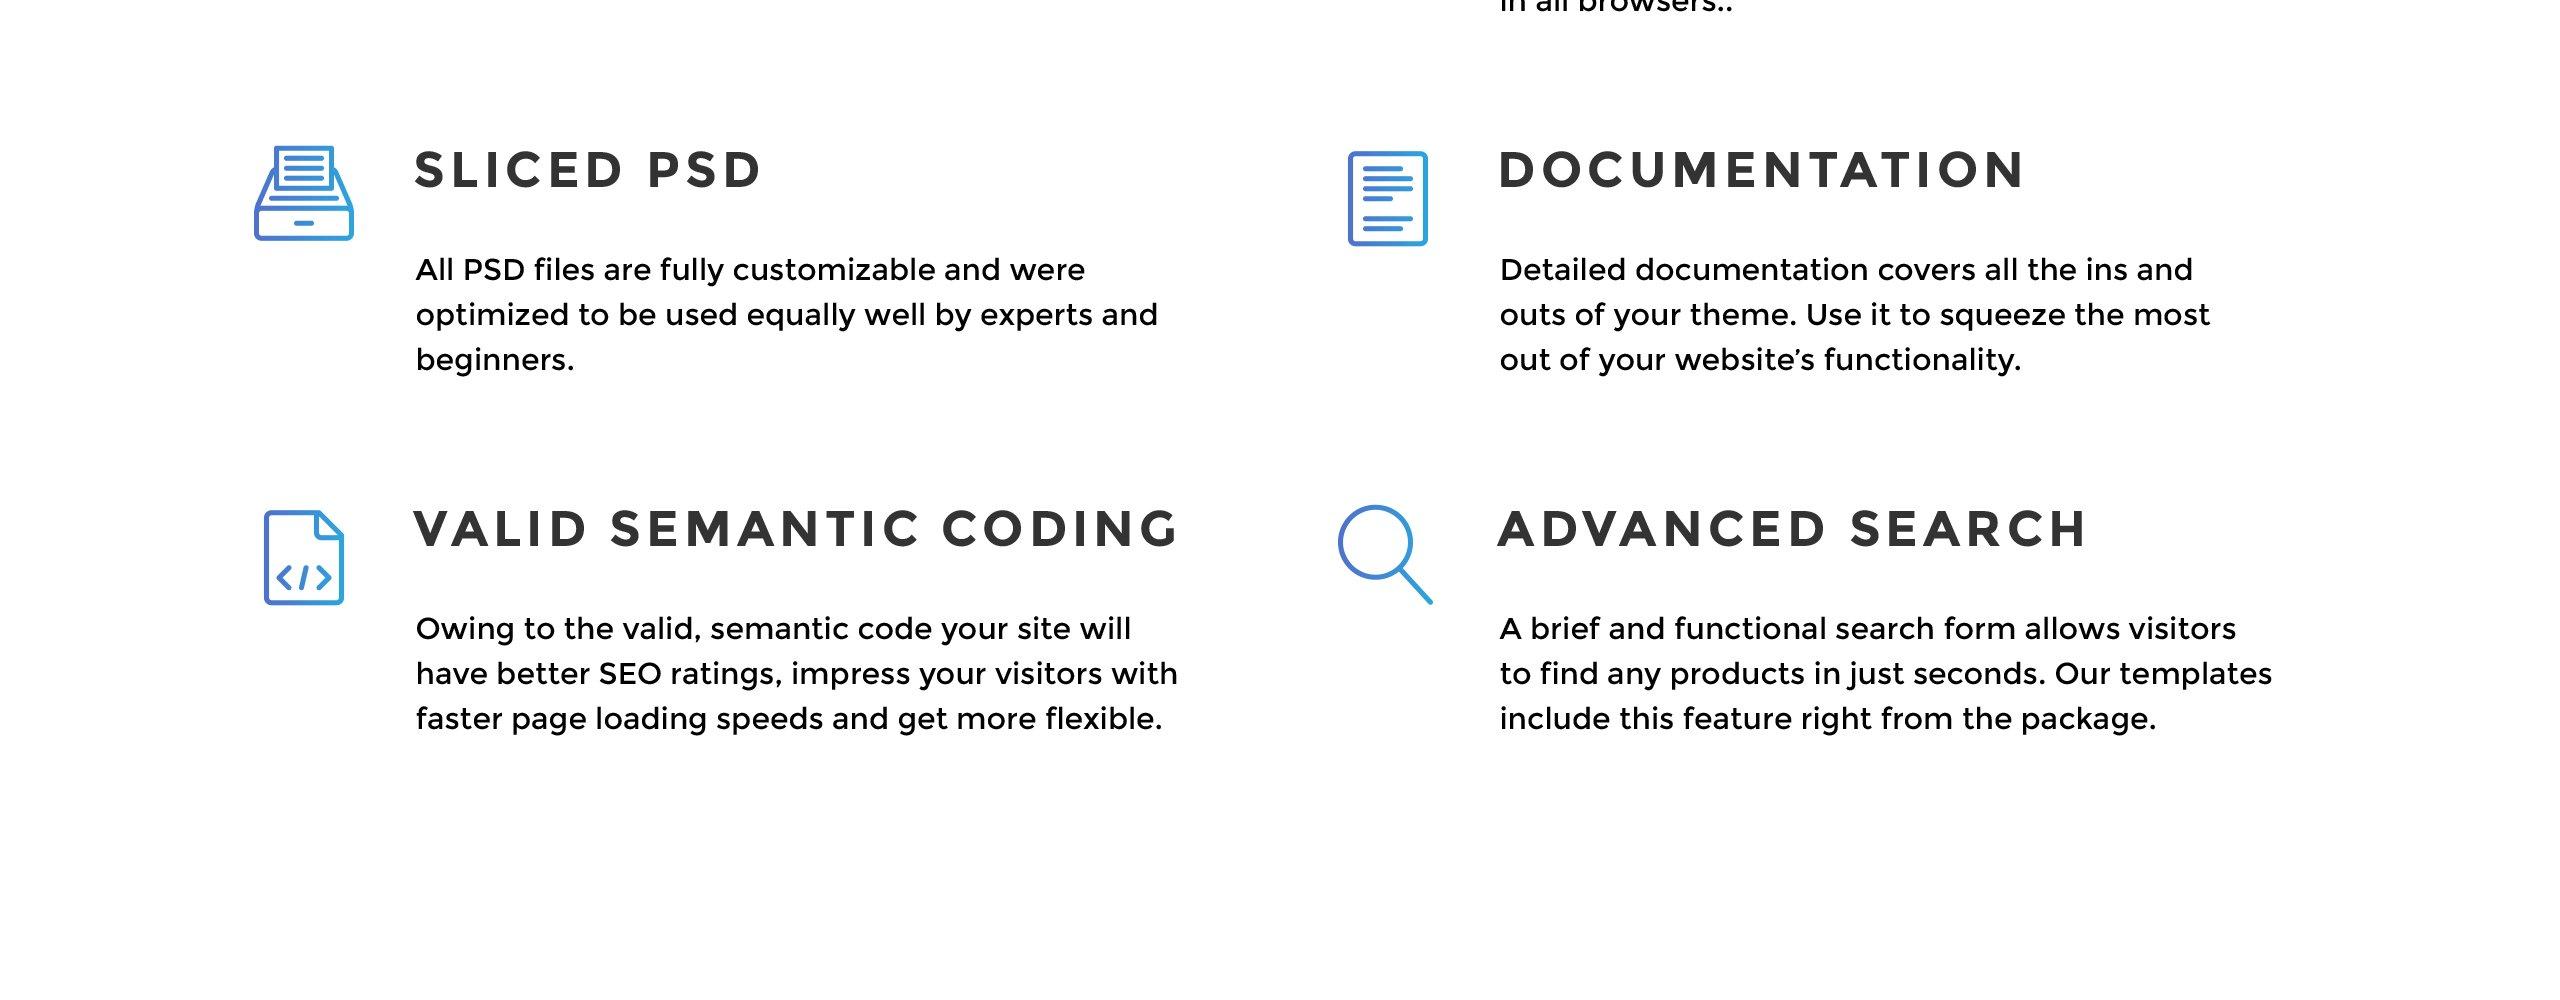 Website Design Template 74464 - supportundefined